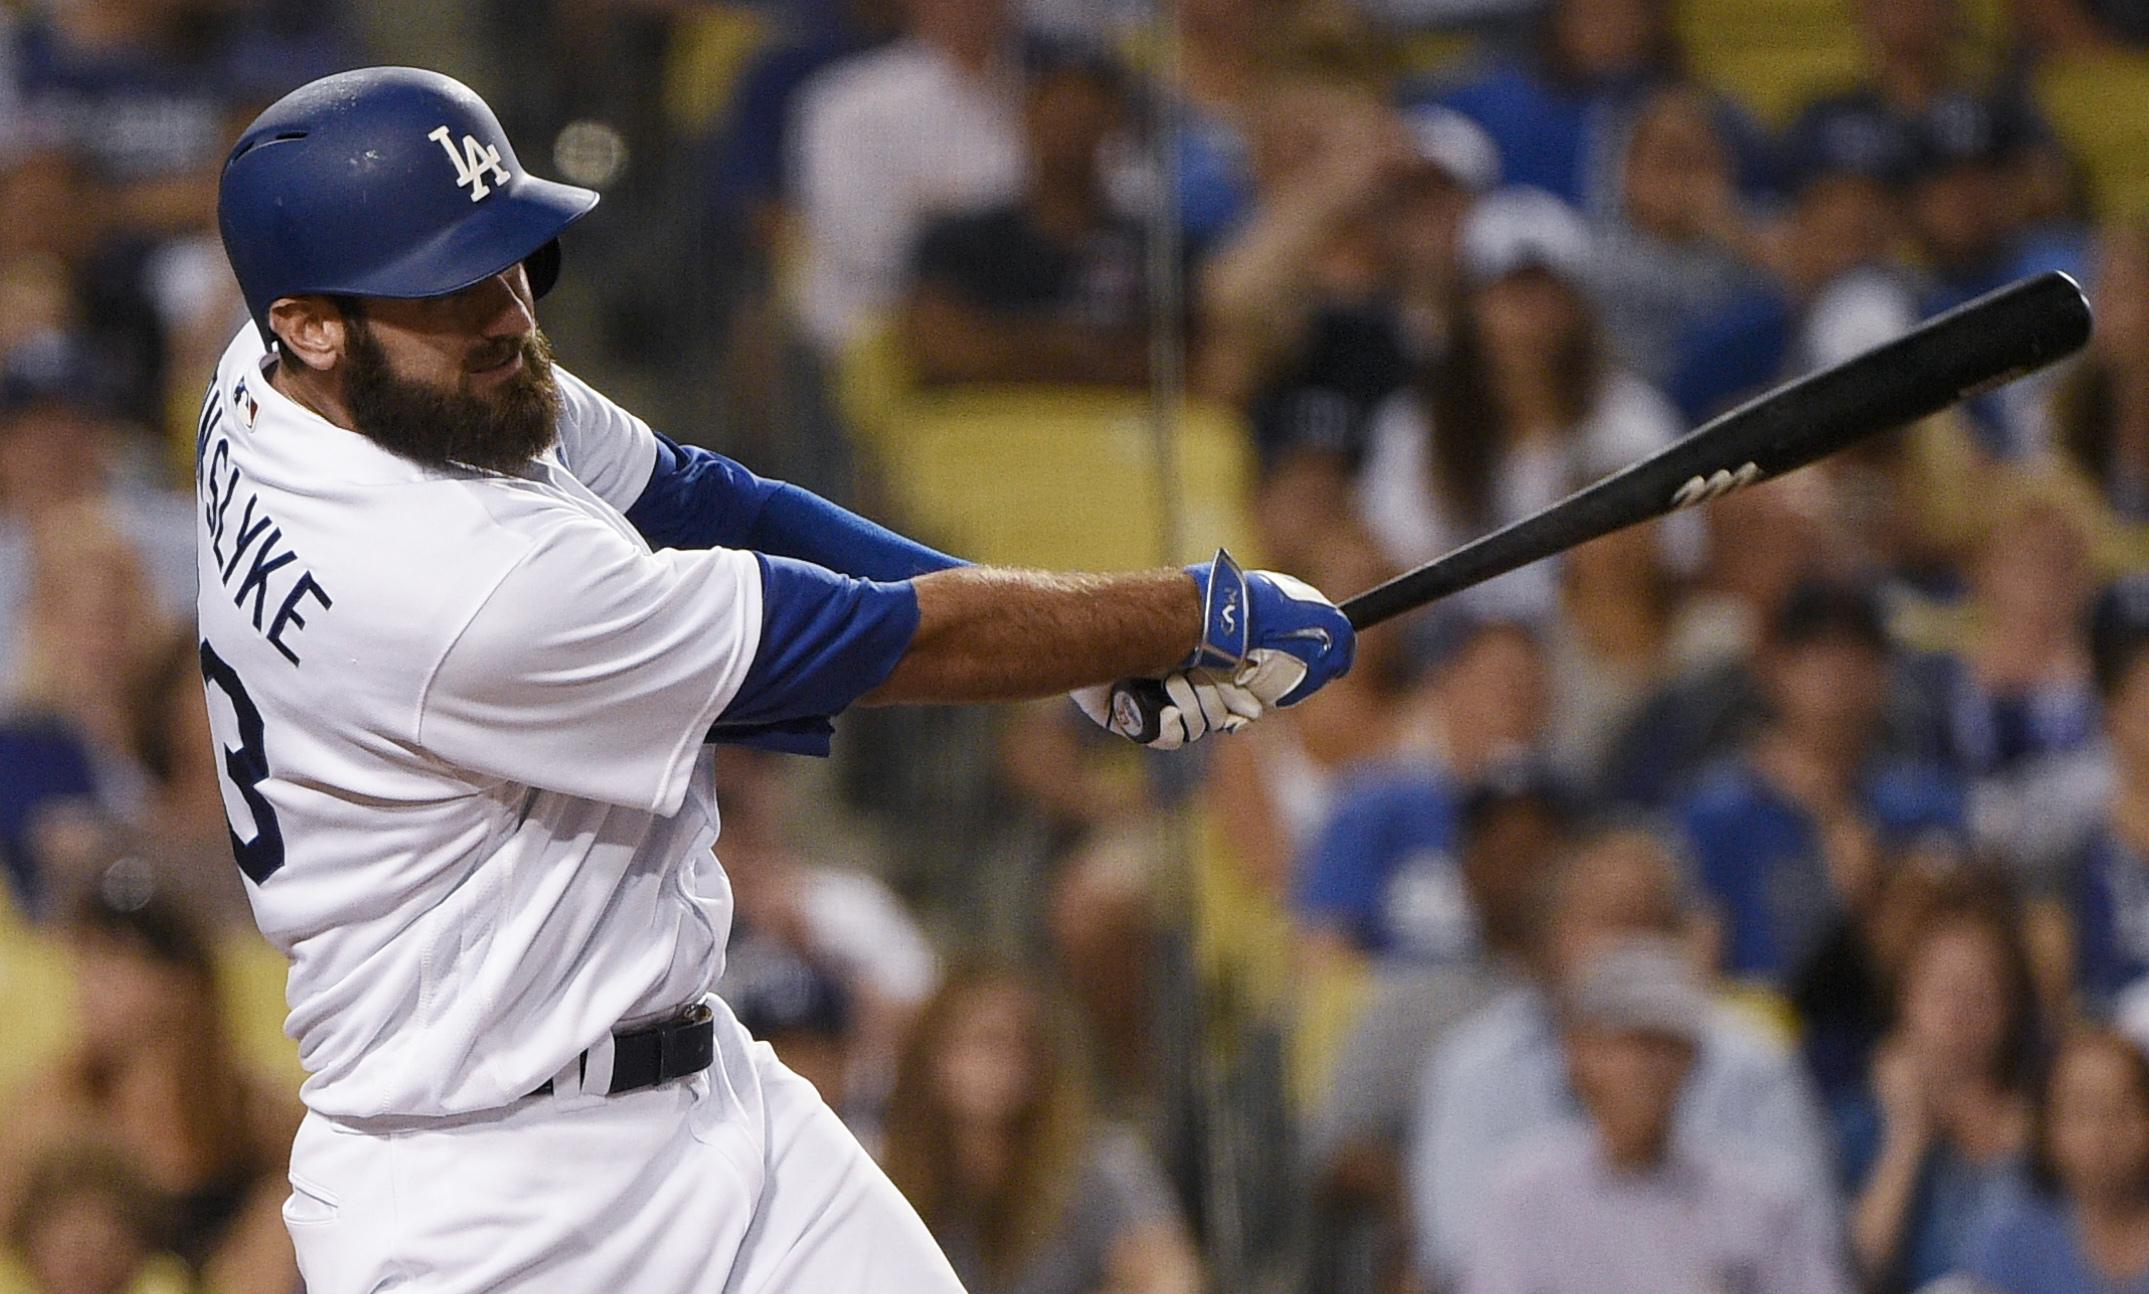 Los Angeles Dodgers' Scott Van Slyke hits an RBI single during the seventh inning of a baseball game against the Arizona Diamondbacks in Los Angeles, Saturday, July 30, 2016. (AP Photo/Kelvin Kuo)